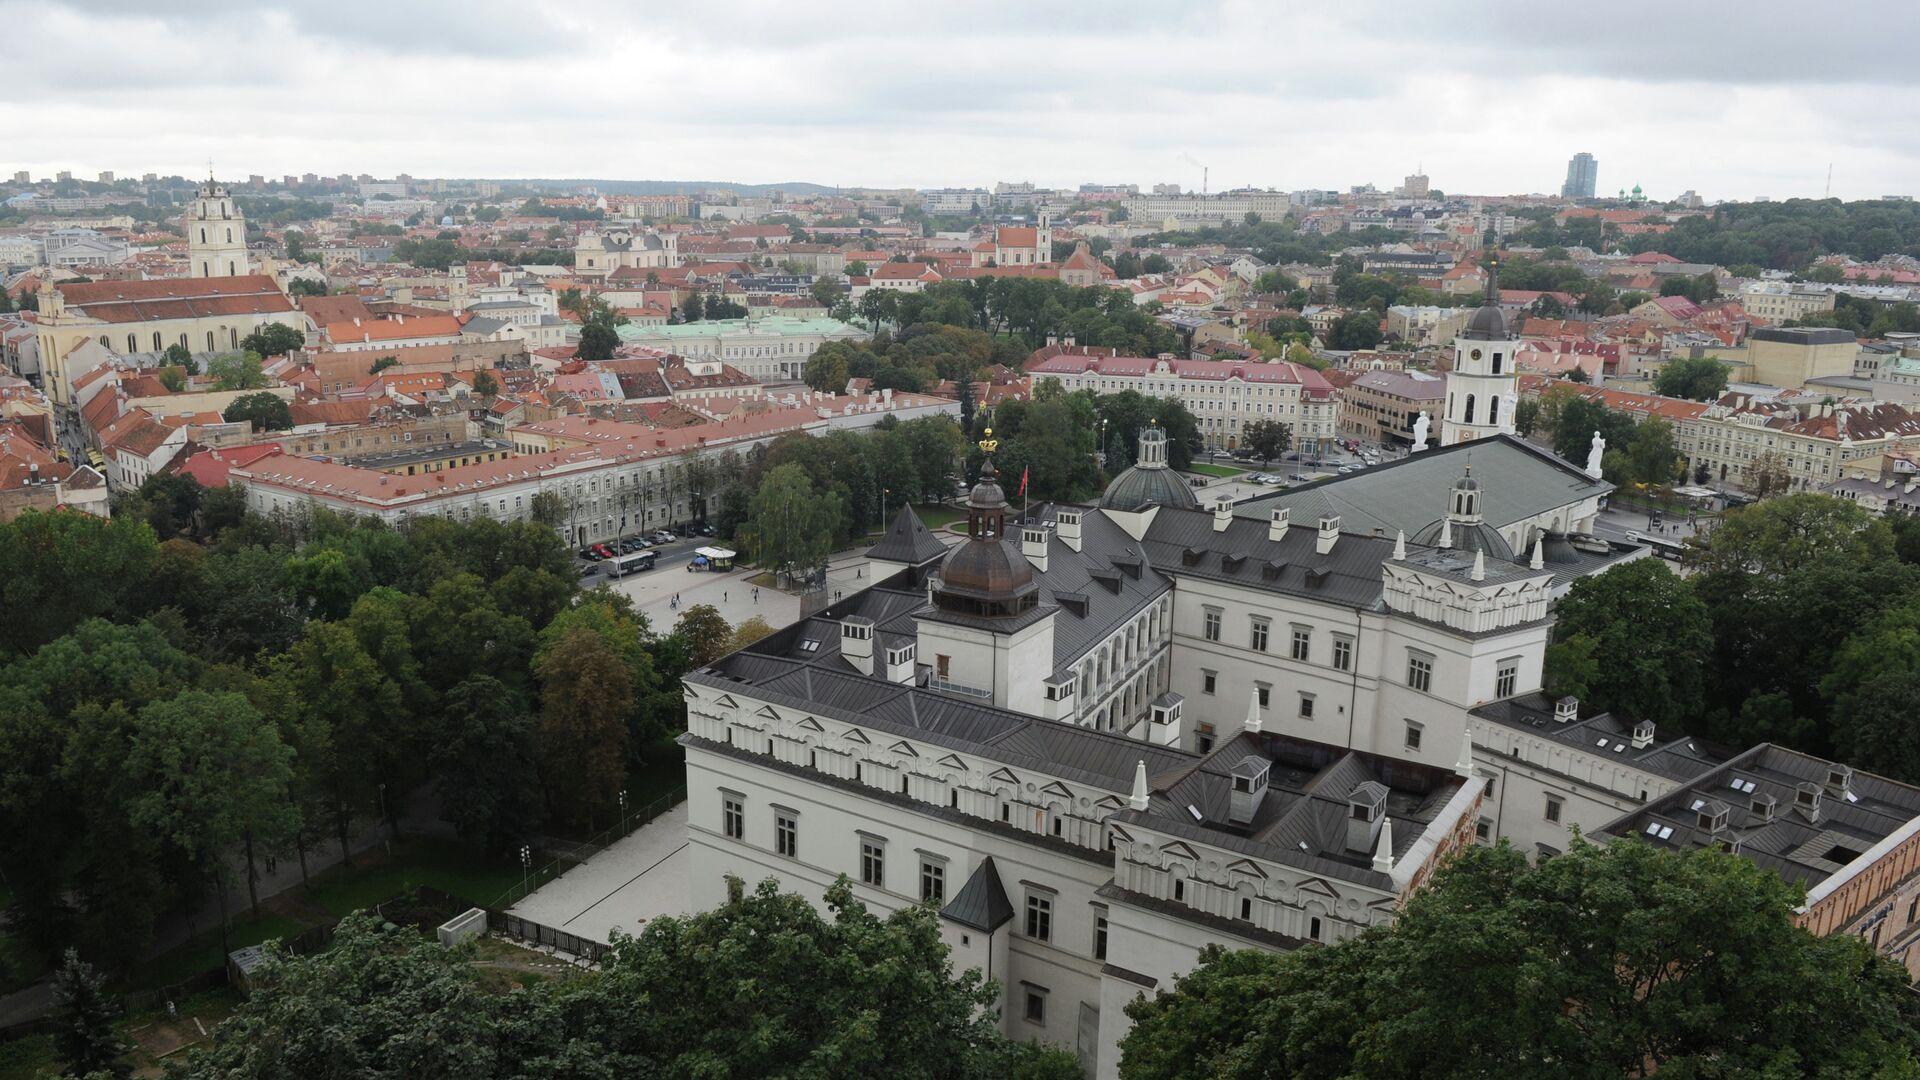 Vilnius, capitale della Lituania - Sputnik Italia, 1920, 23.05.2021